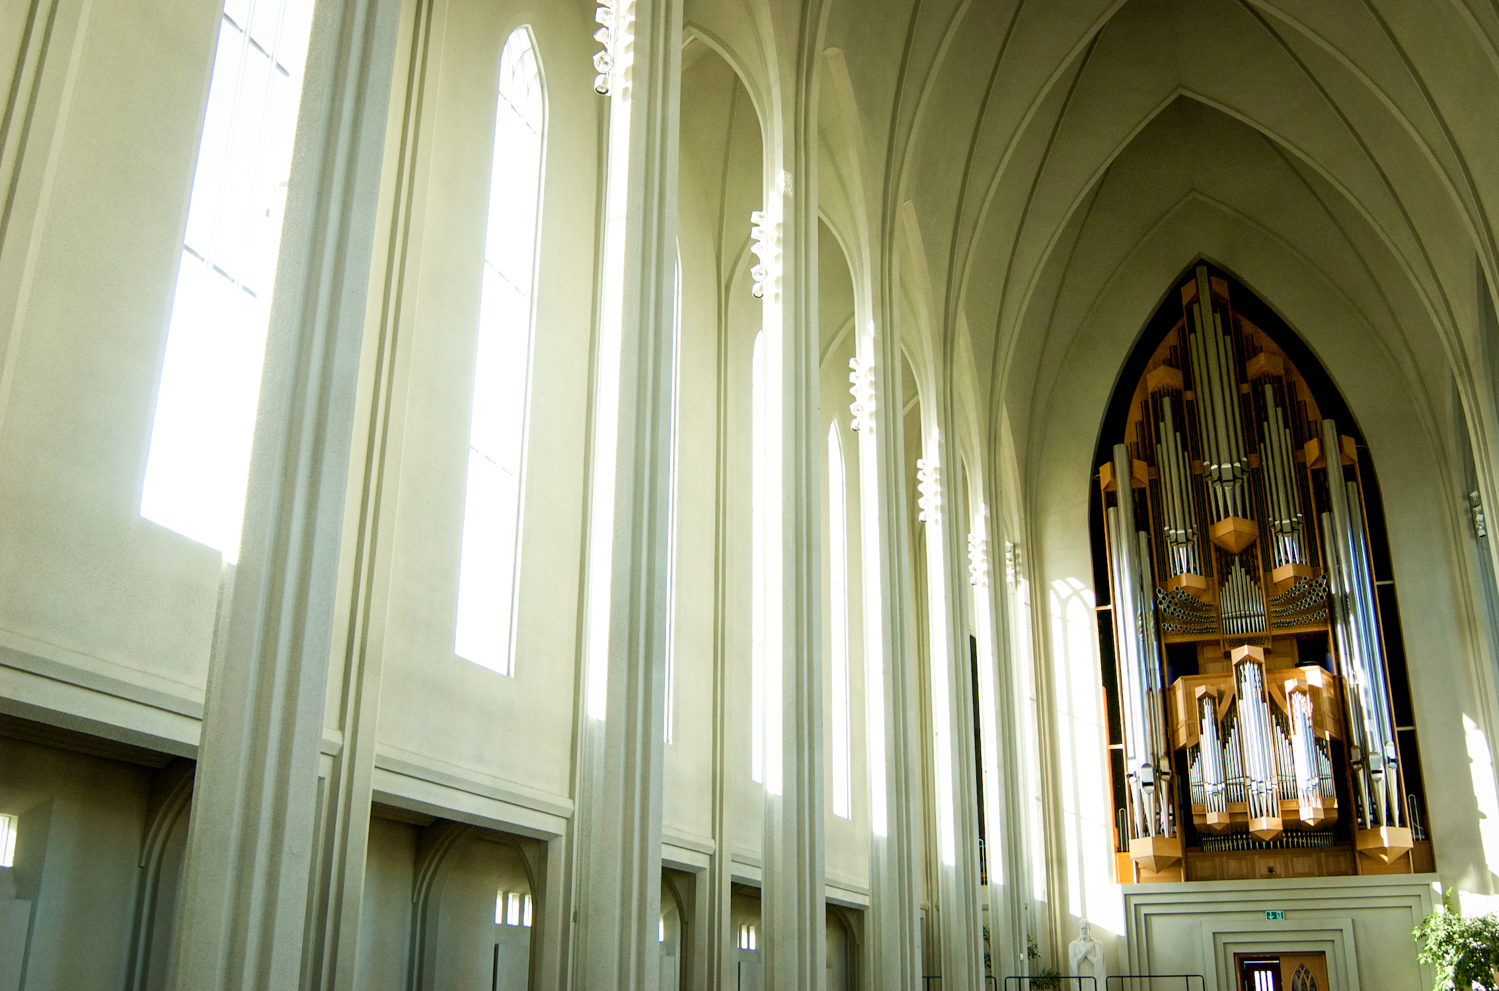 luzod-design-co-mae-iceland-hallagrimskirkja-church-pipeorgans.jpg